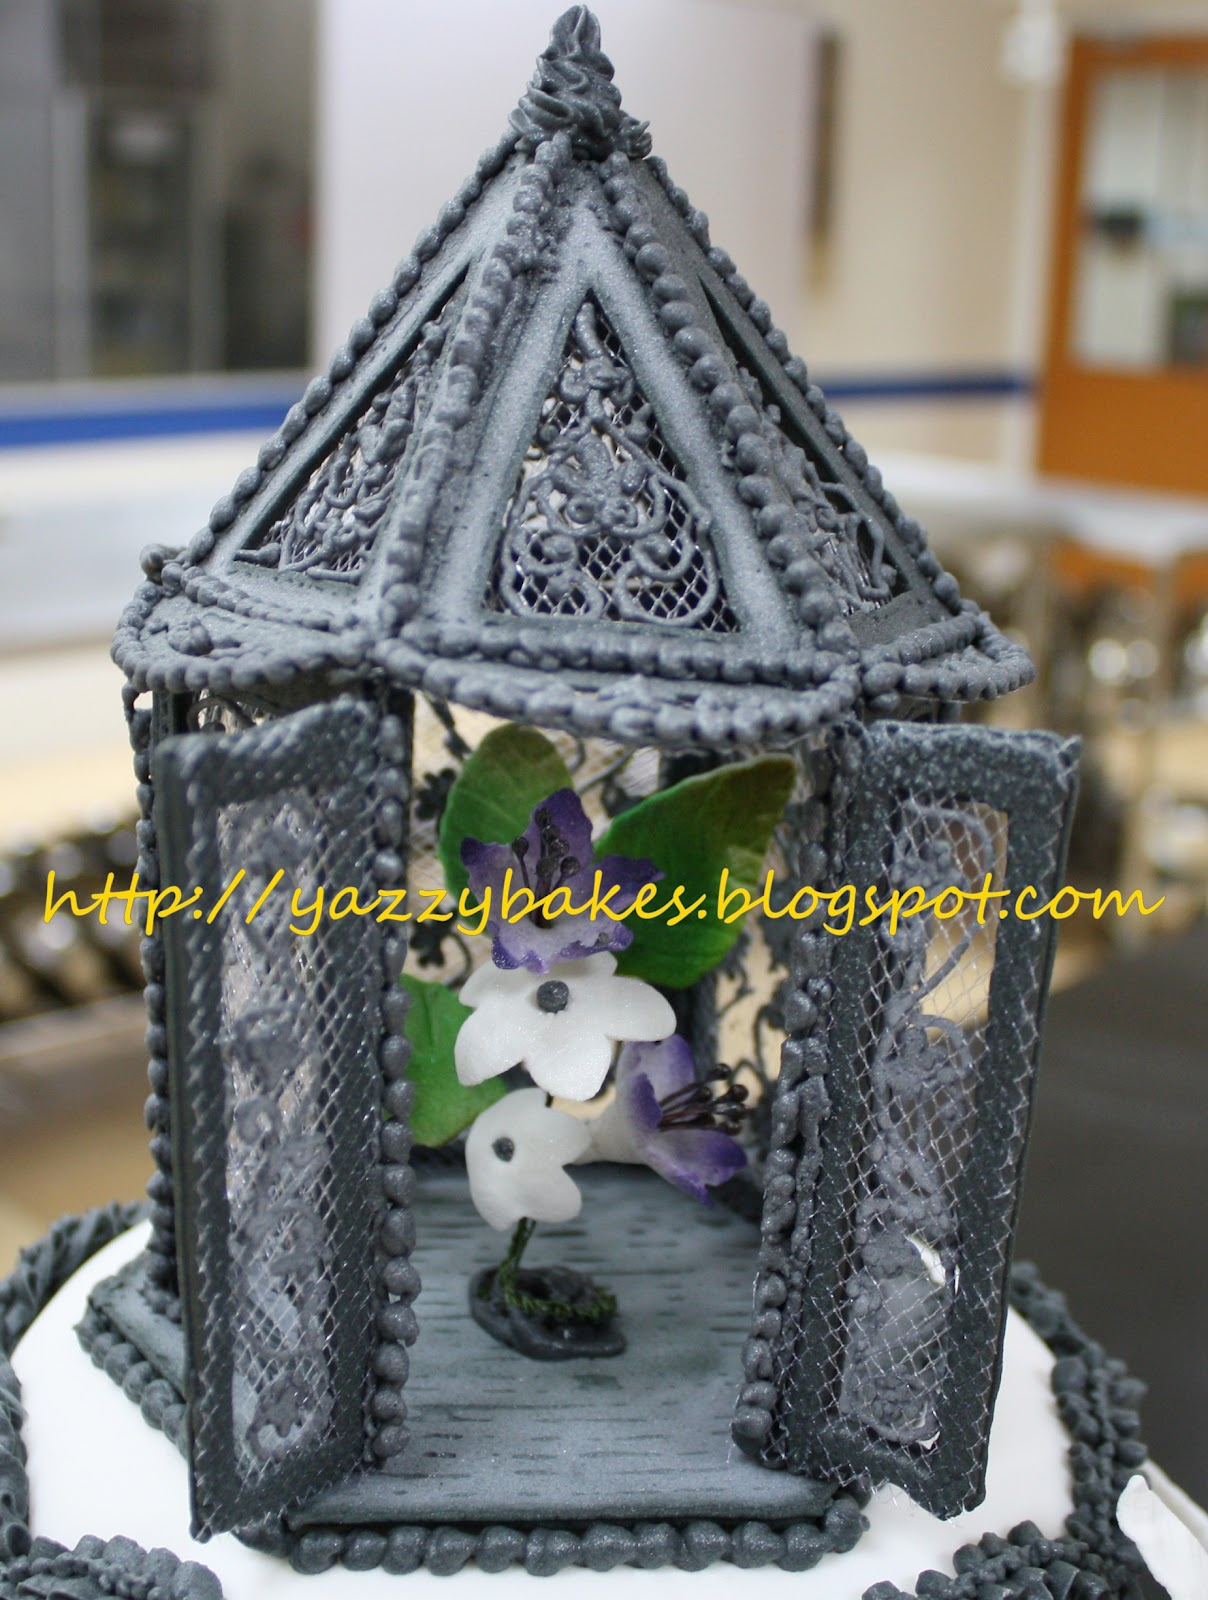 Yazzy Bakes Black White & Purple Wedding Cake Between